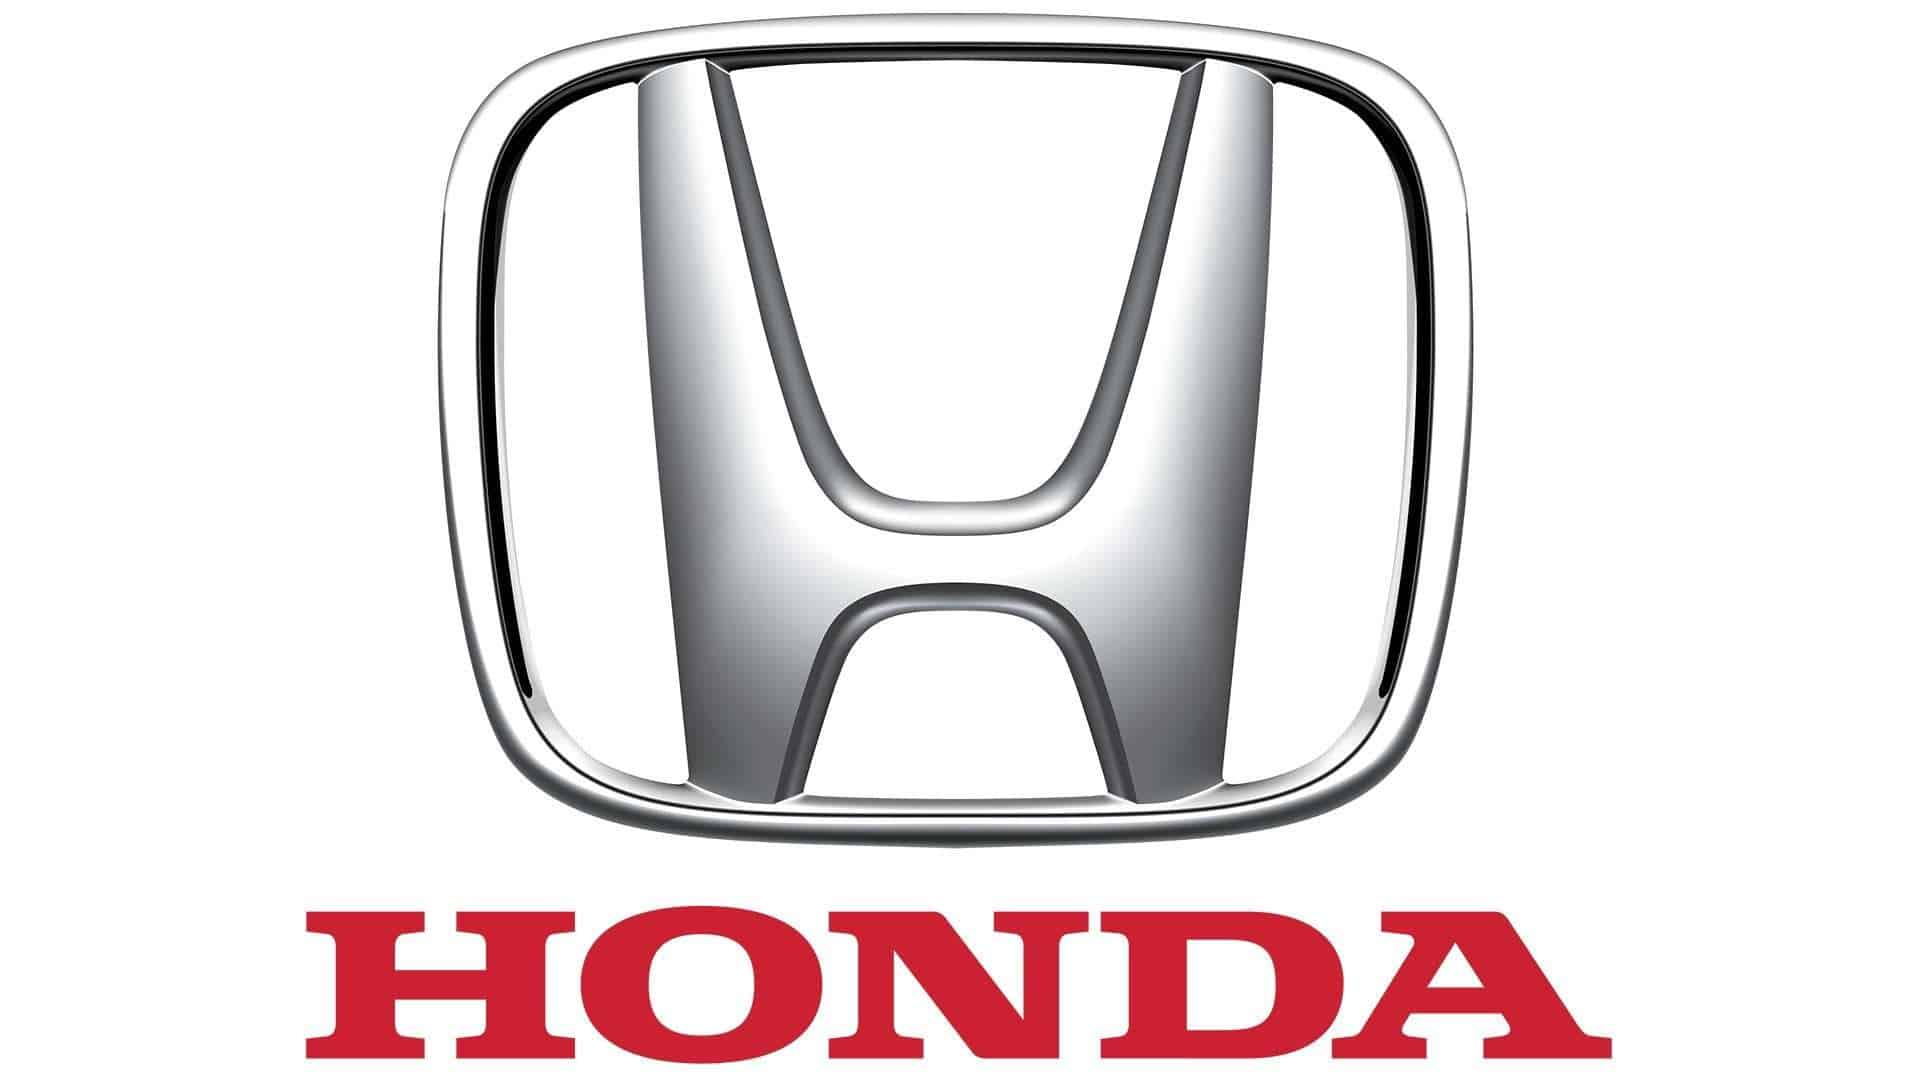 Honda Auto Body and Collision Repair